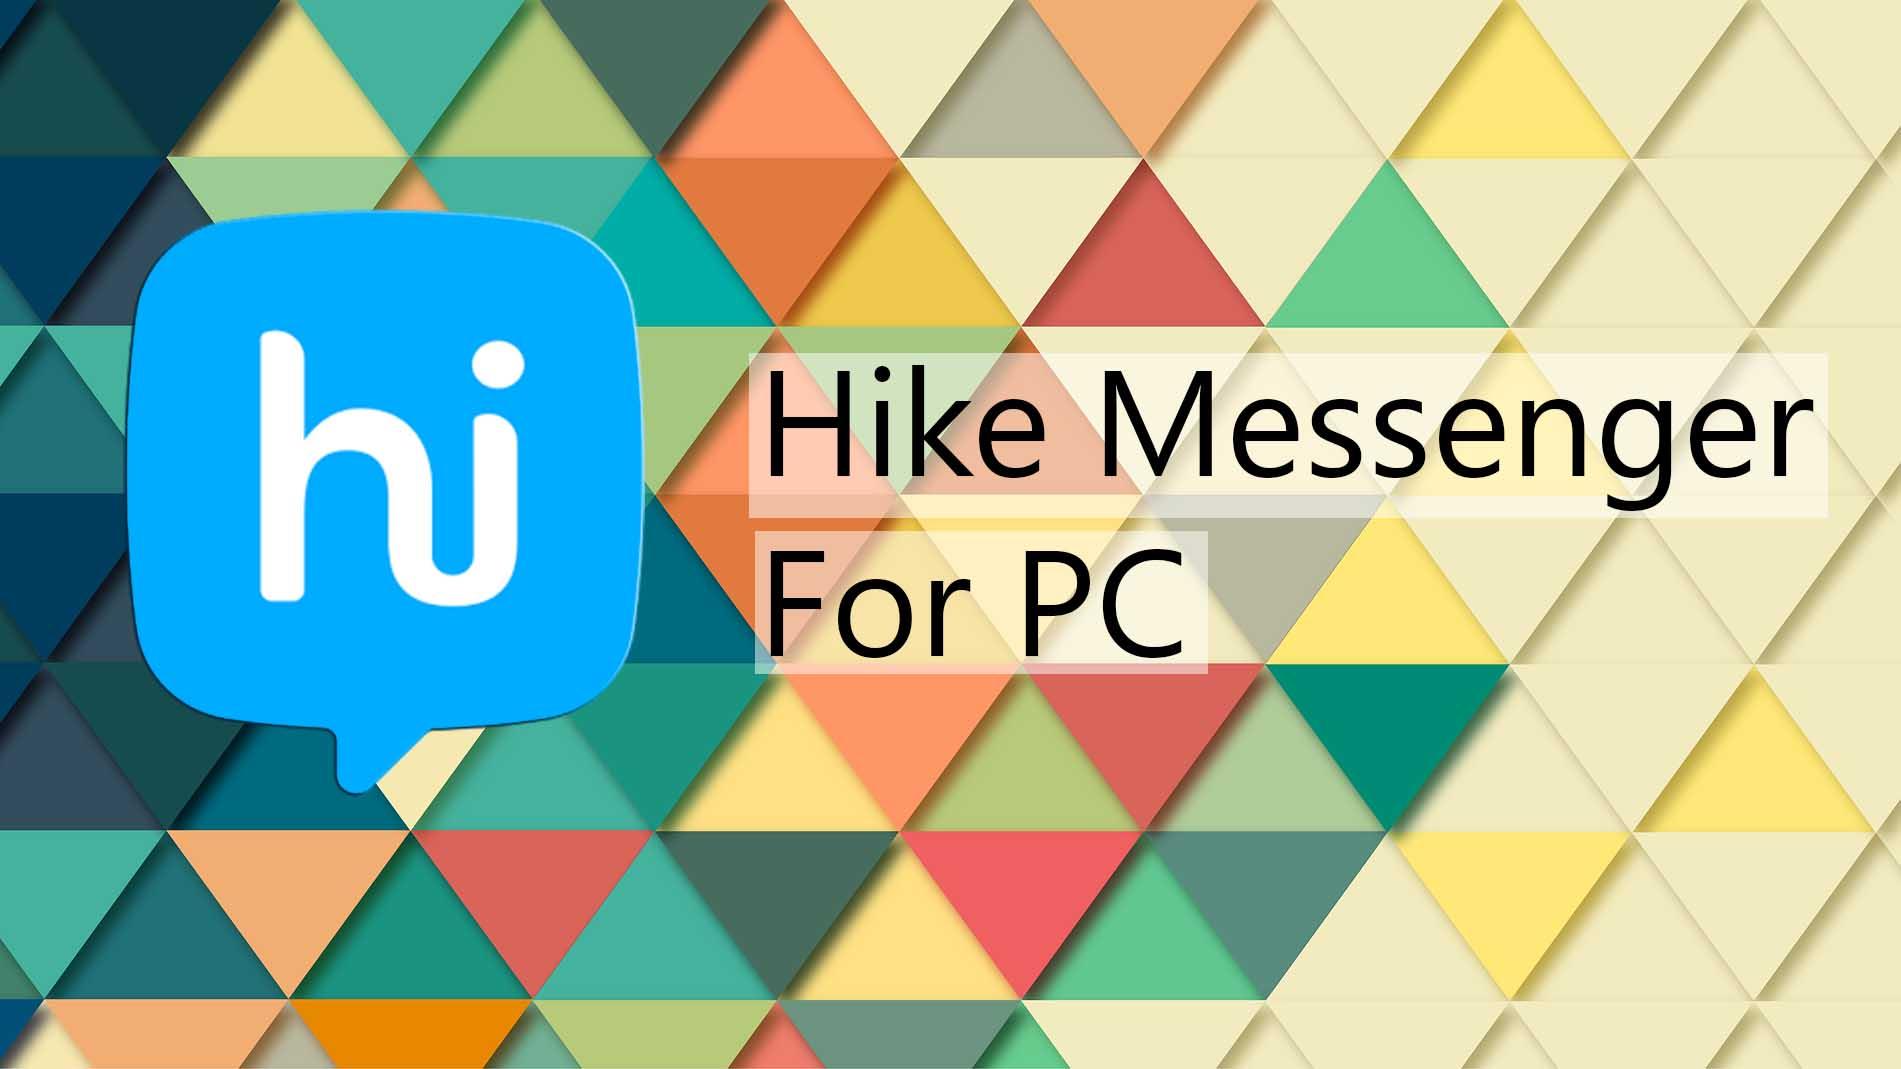 Hike Messenger for PC